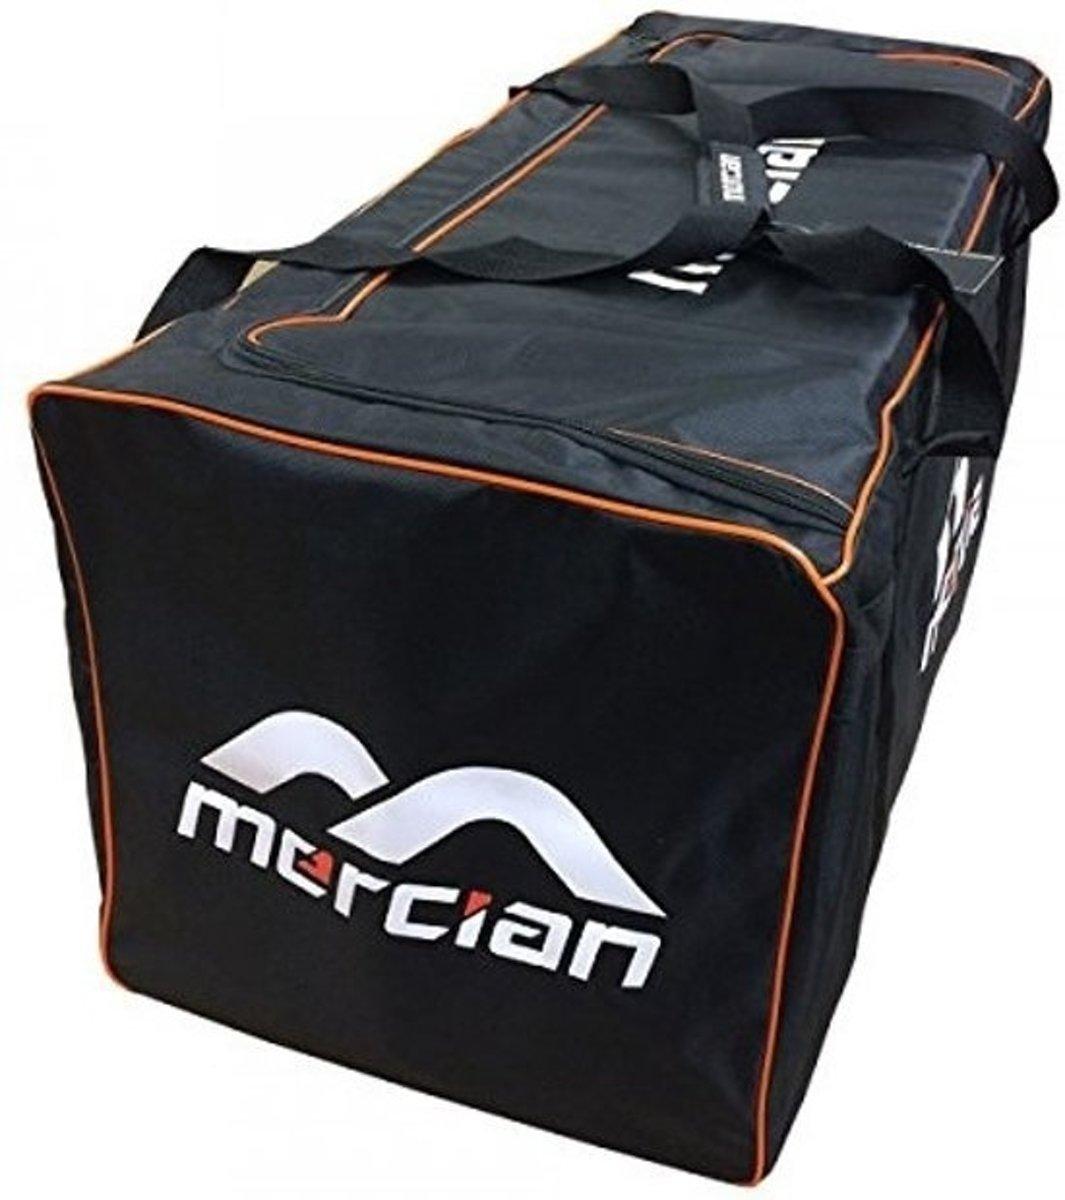 Mercian Sporttas Genesis 0.2 Gk Zwart/oranje 92 X 41 X 41 Cm kopen